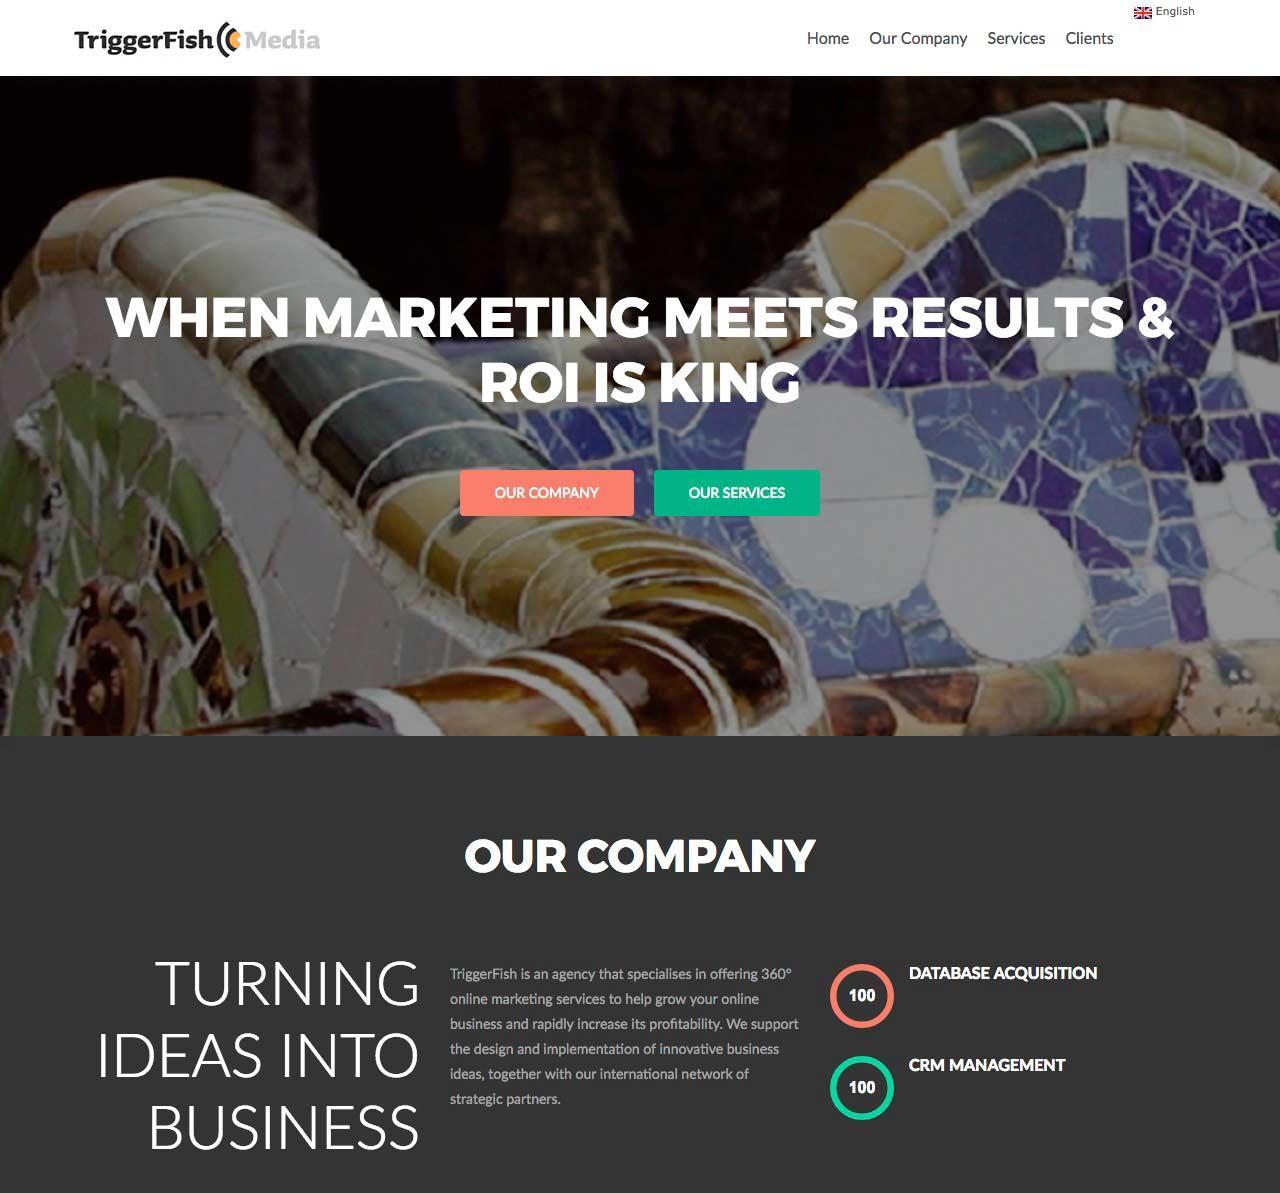 Triggerfish-Media-project